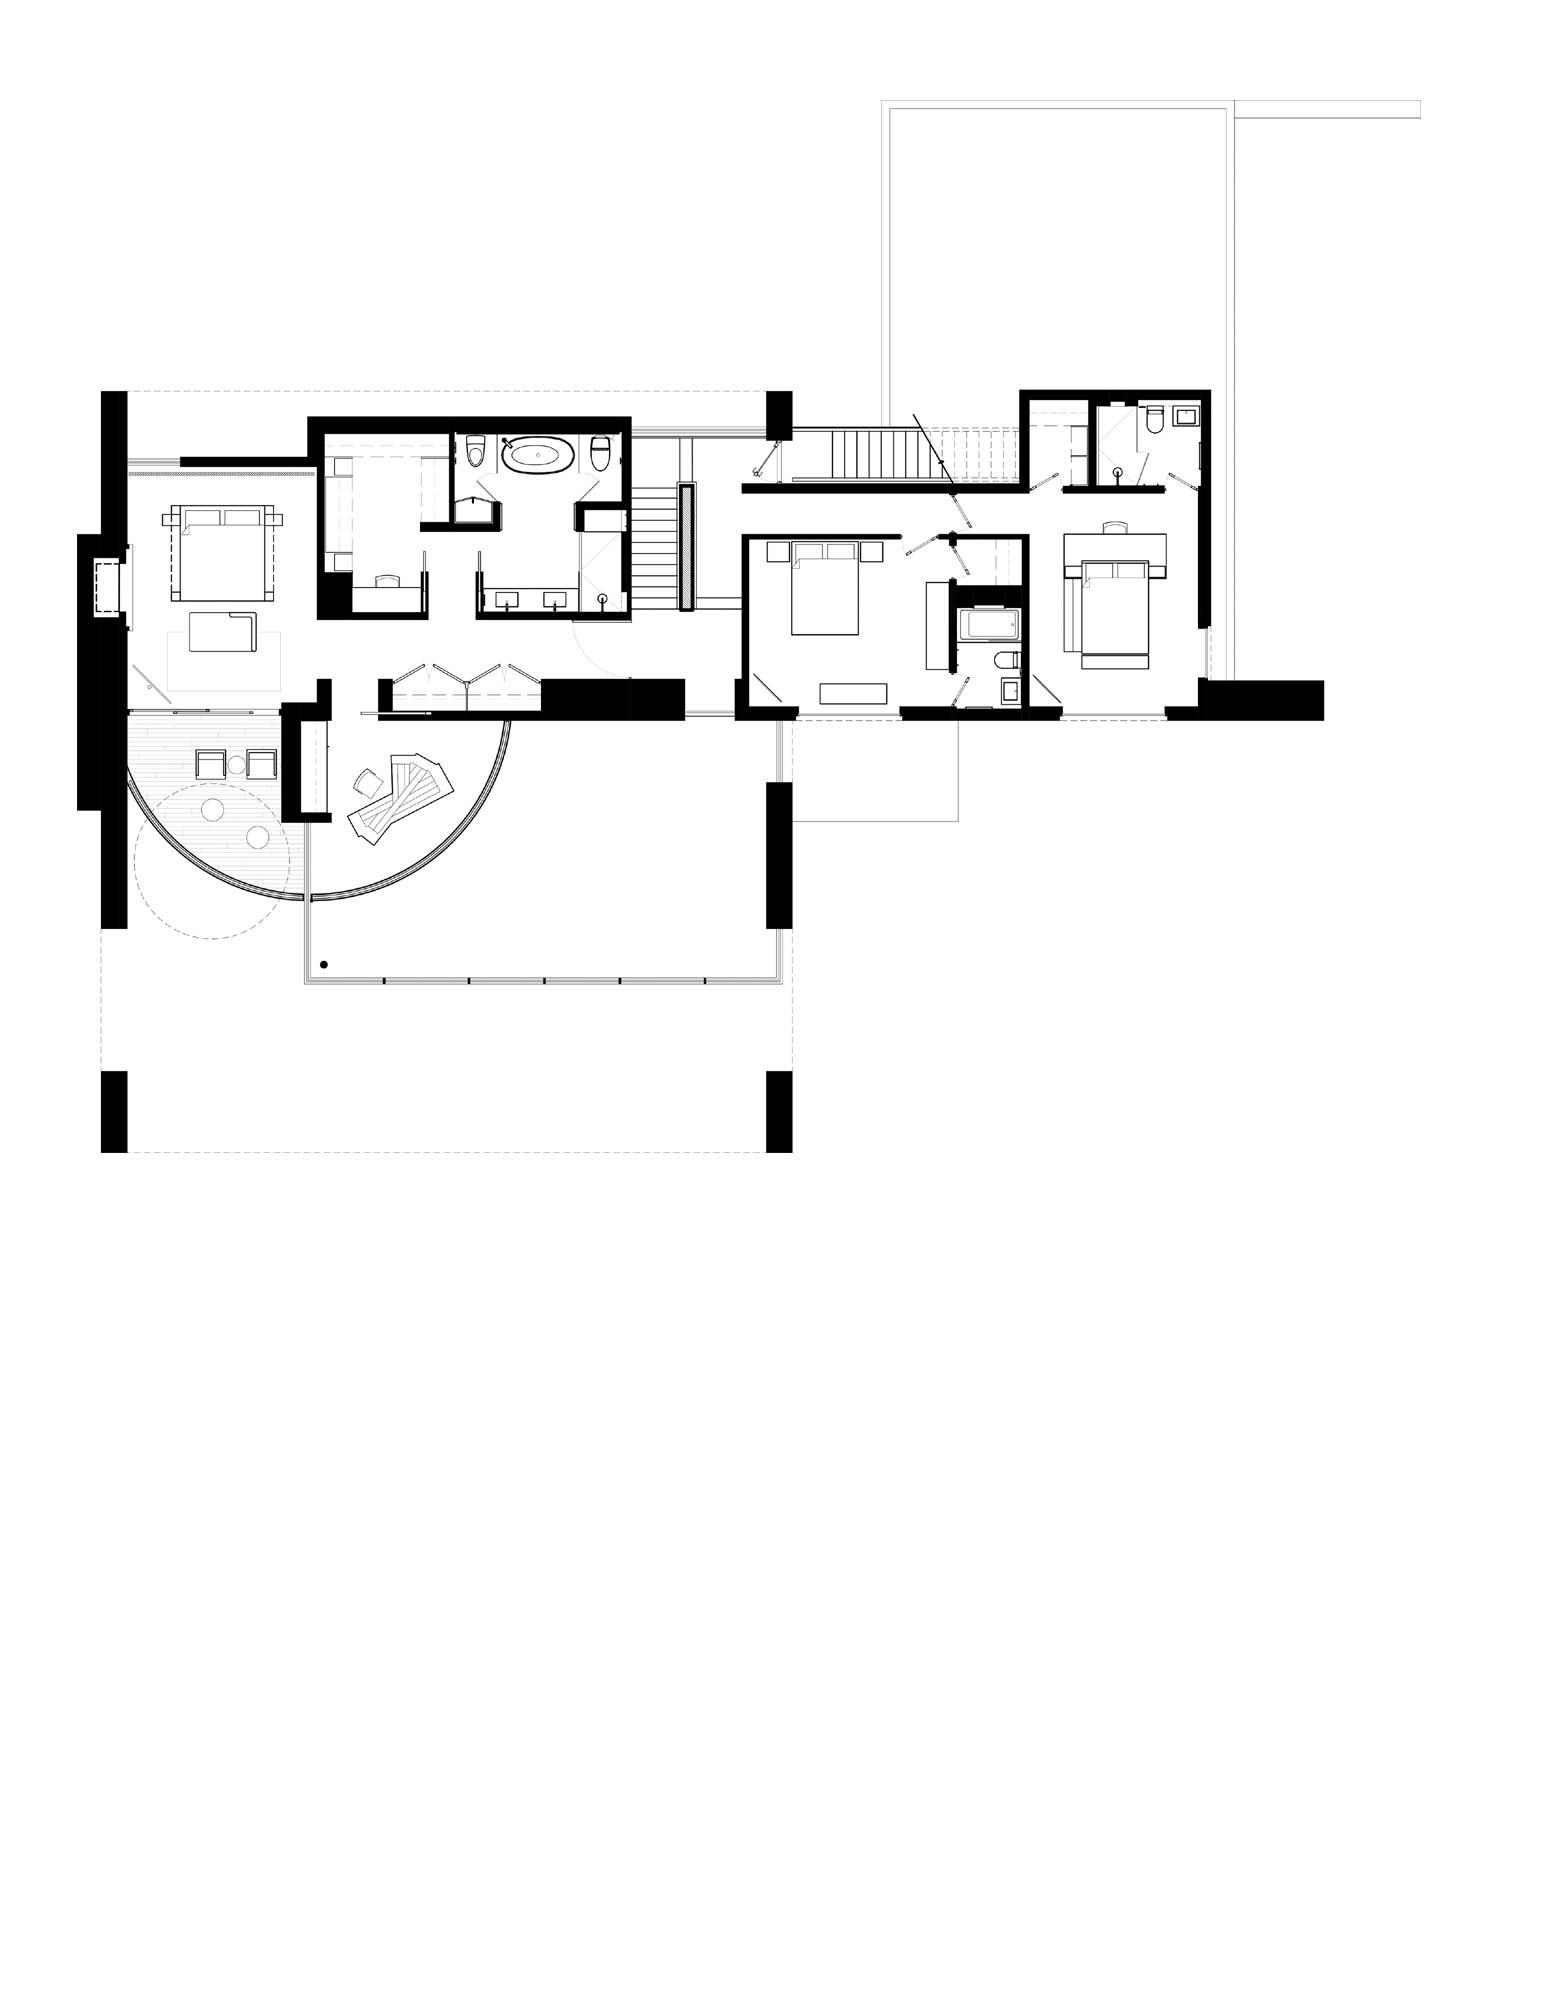 Hamptons Real Estate Showcase: Barnes Coy Architects